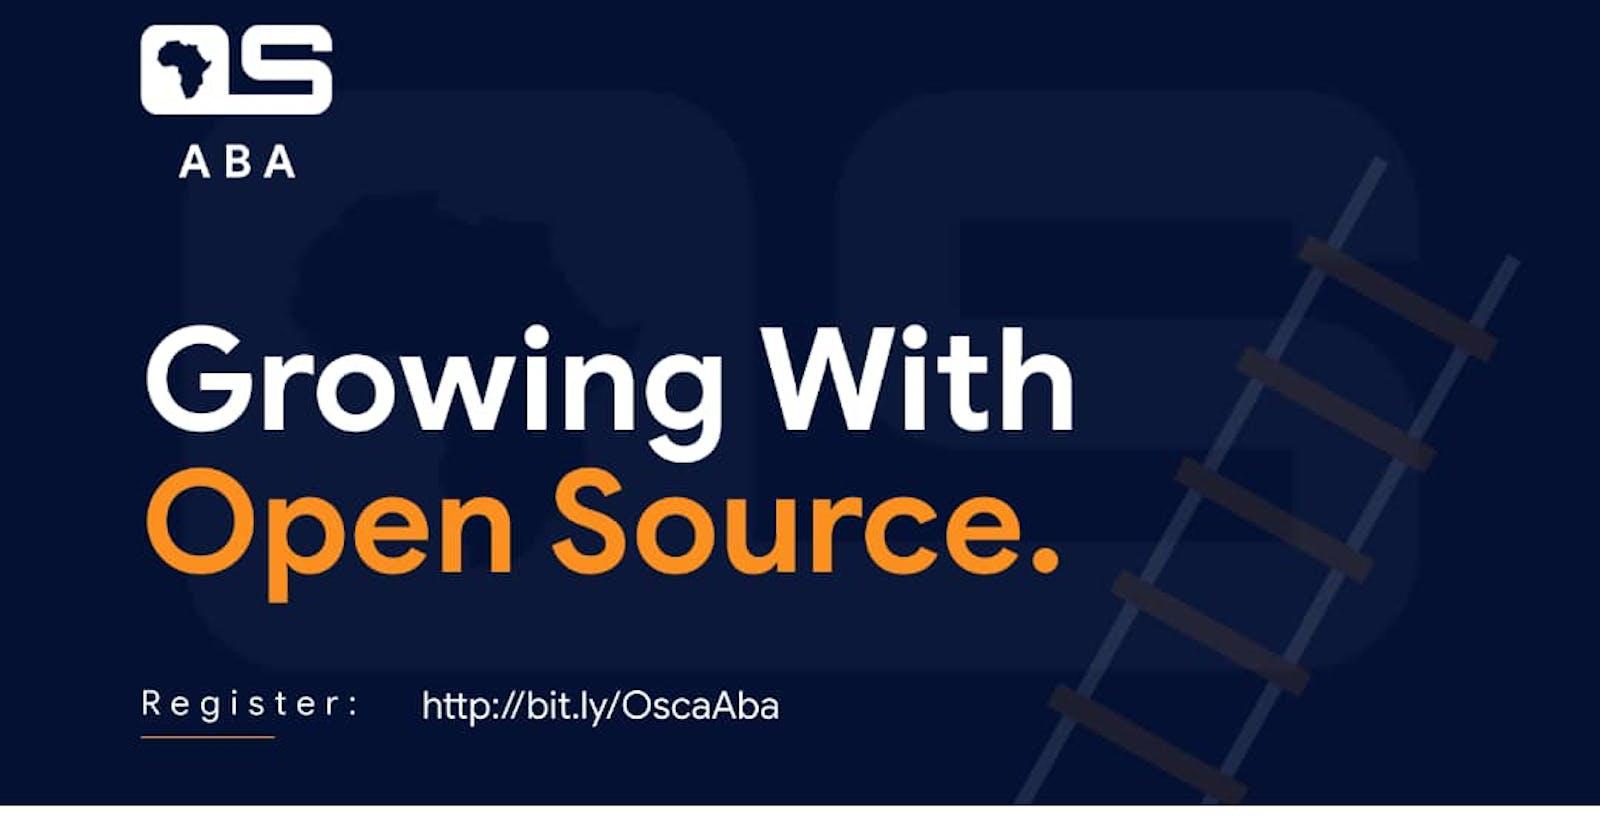 OSCA Aba Launch: GROWING WITH OPEN SOURCE